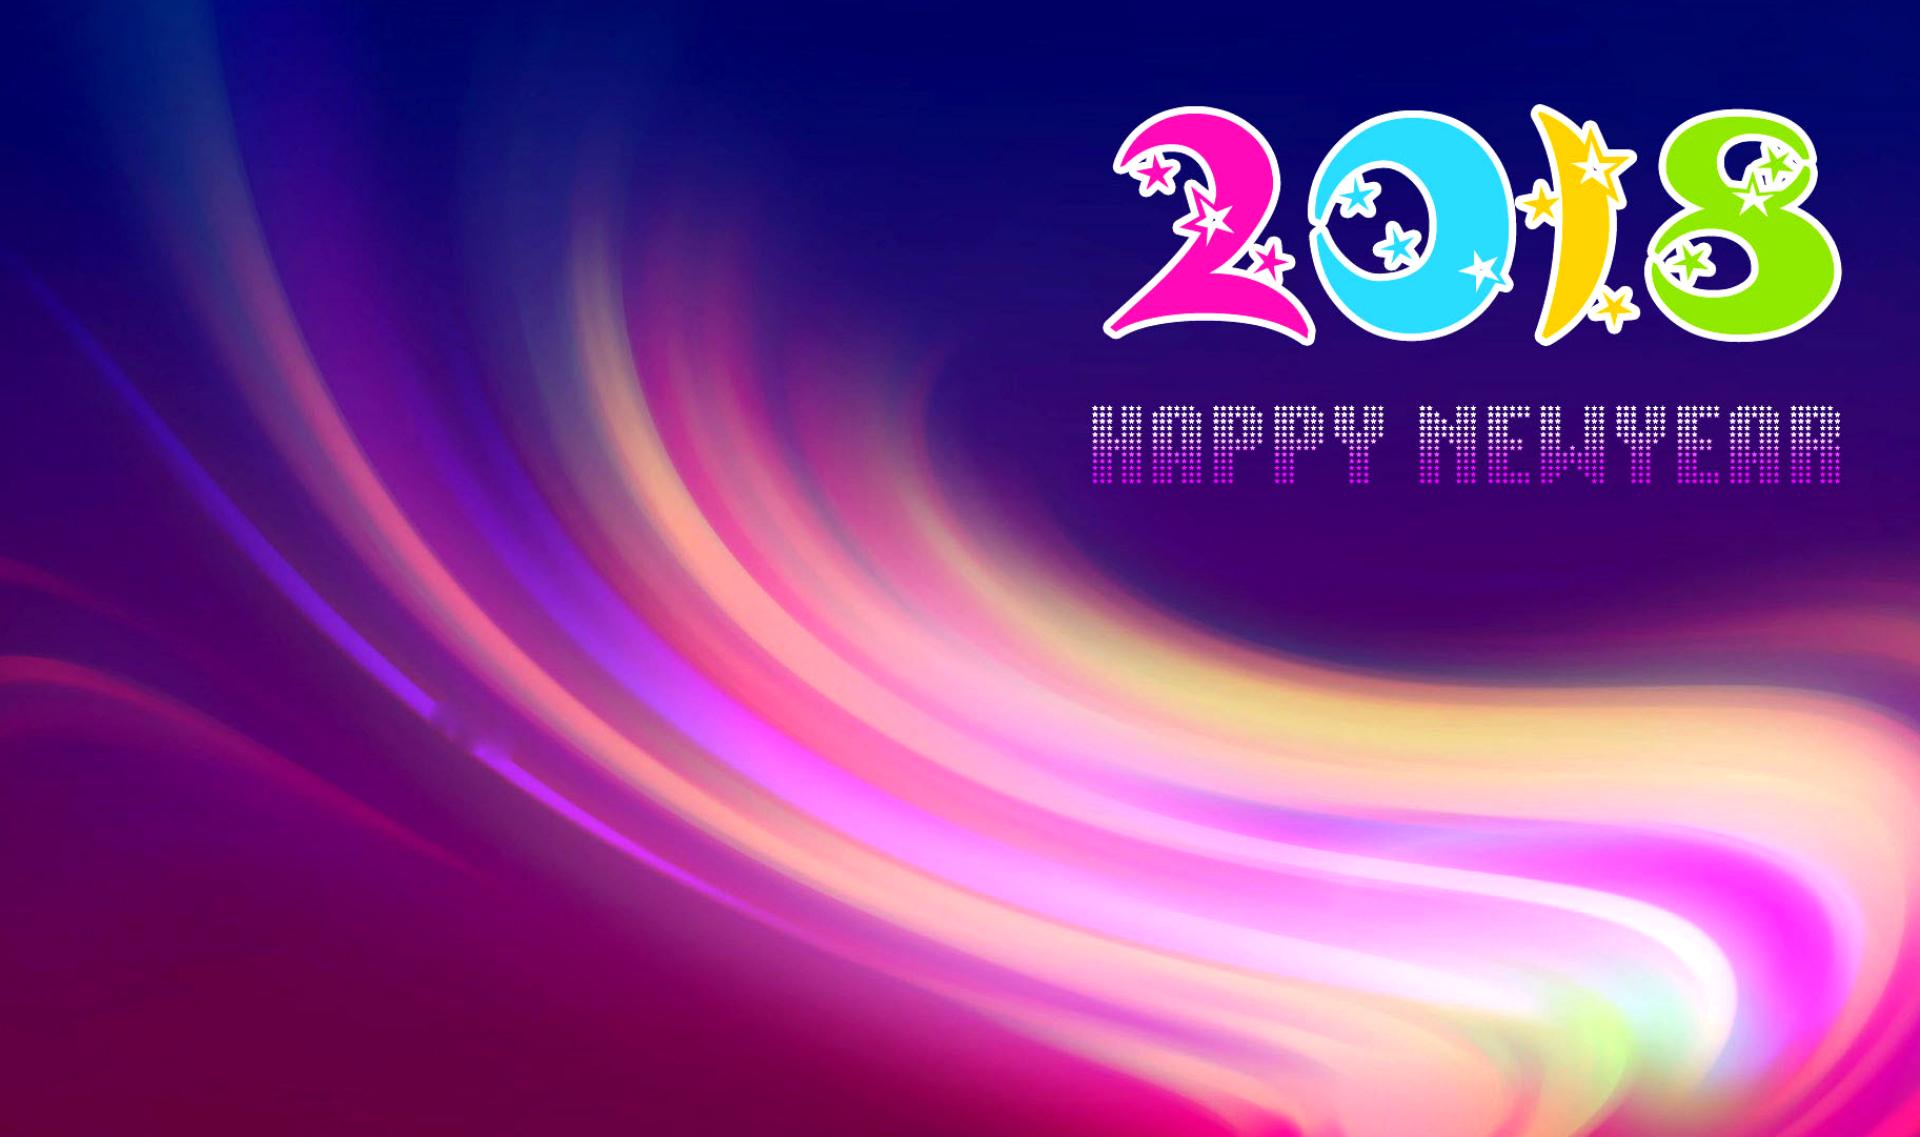 happy new year hd wallpaper wishes 2018 hd wallpaper 4 us 1920x1137